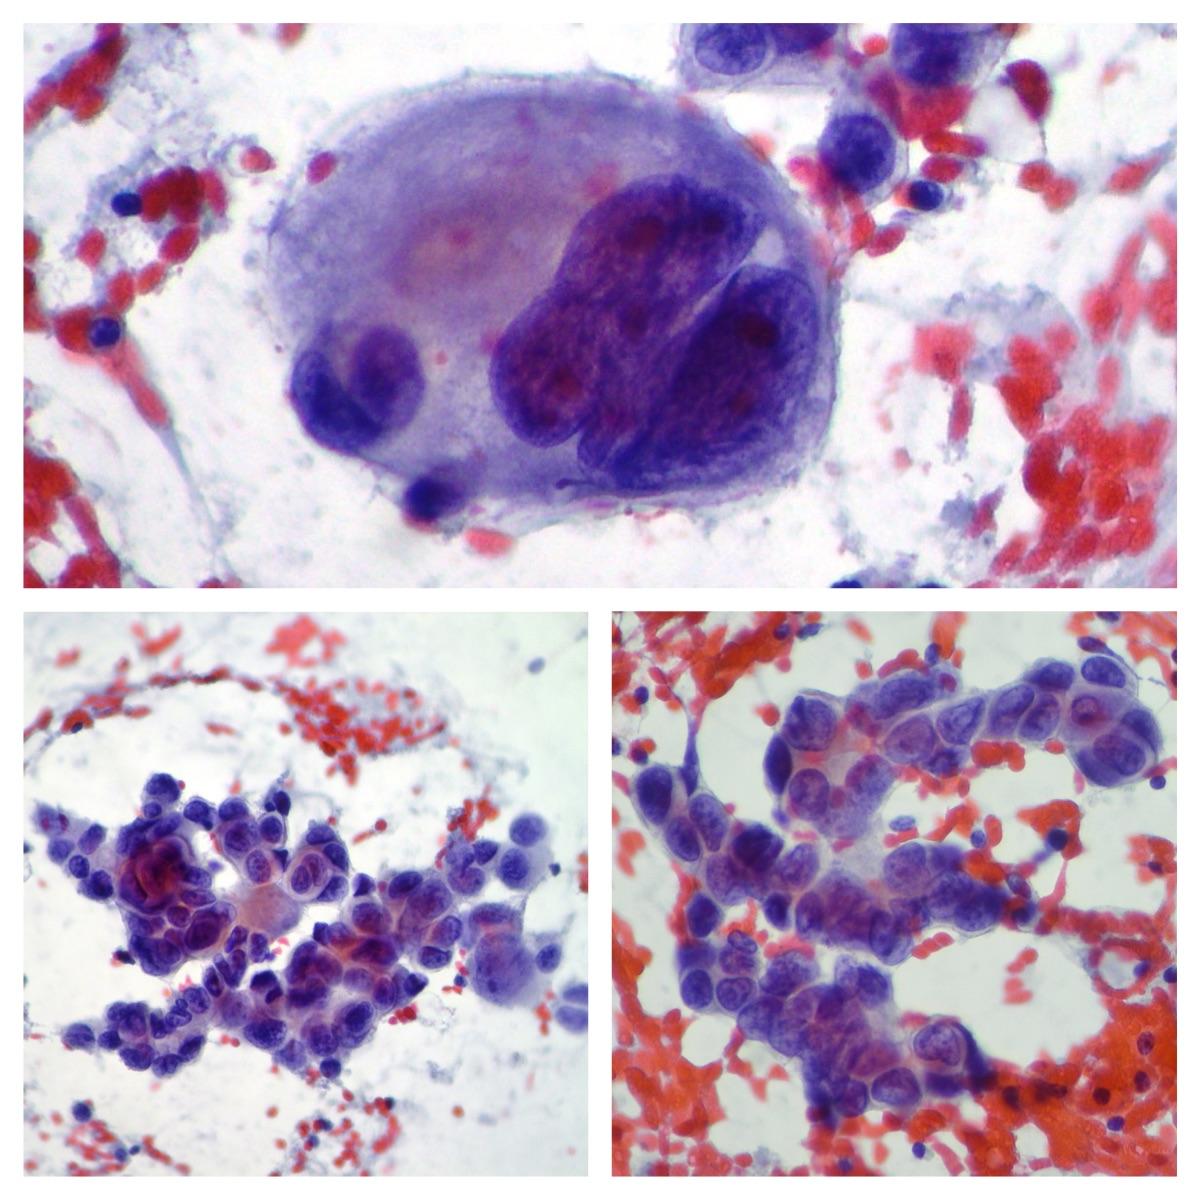 Paget Breast Cancer Metastatic